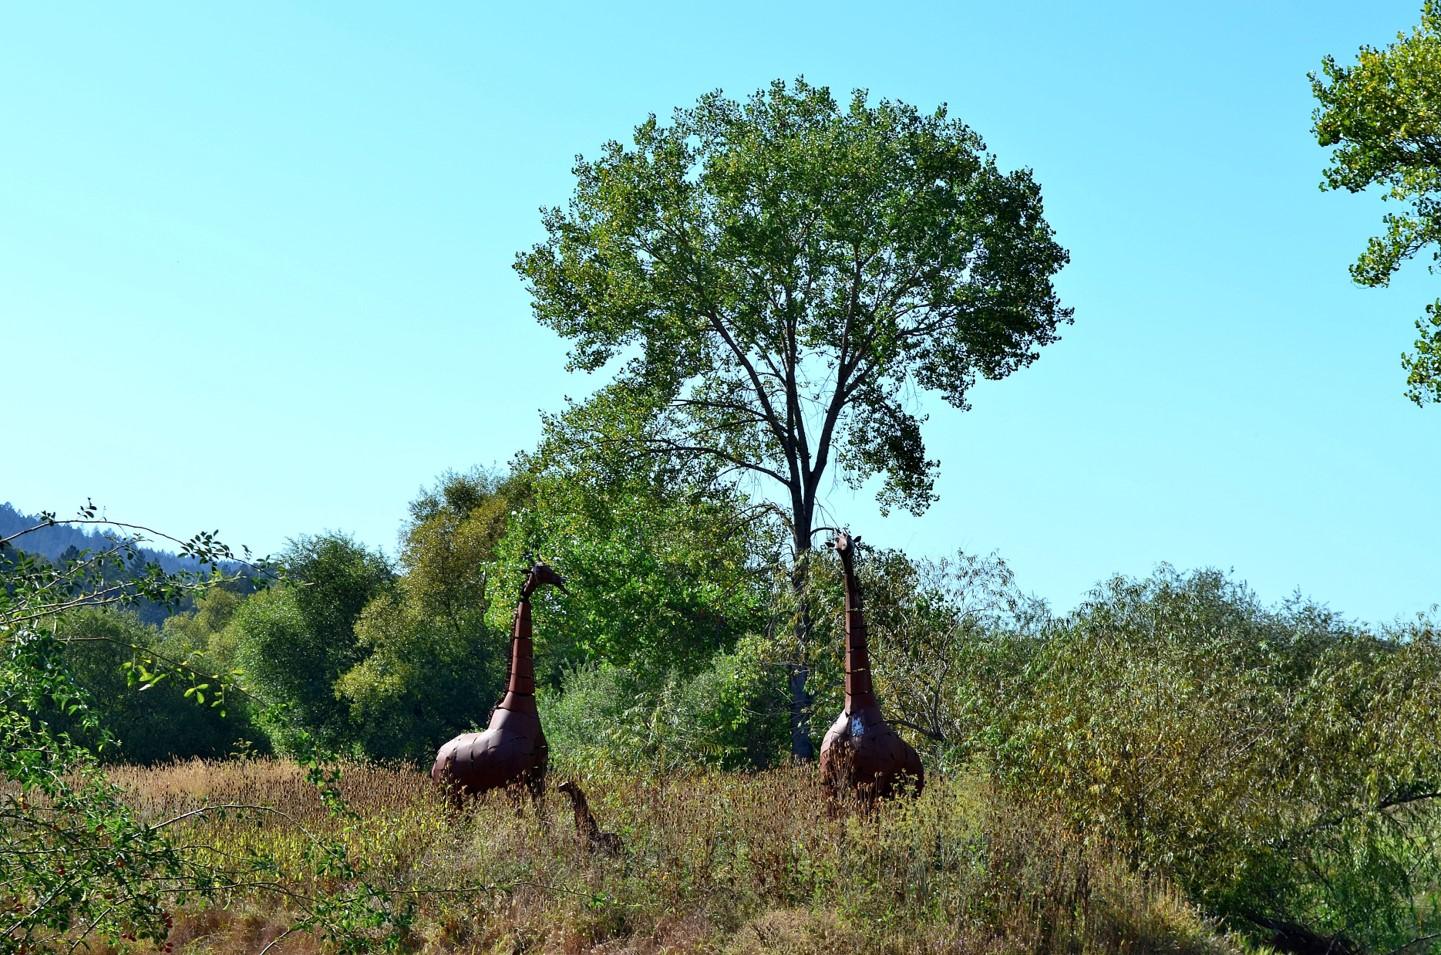 Deerfield Ranch Winery giraffes